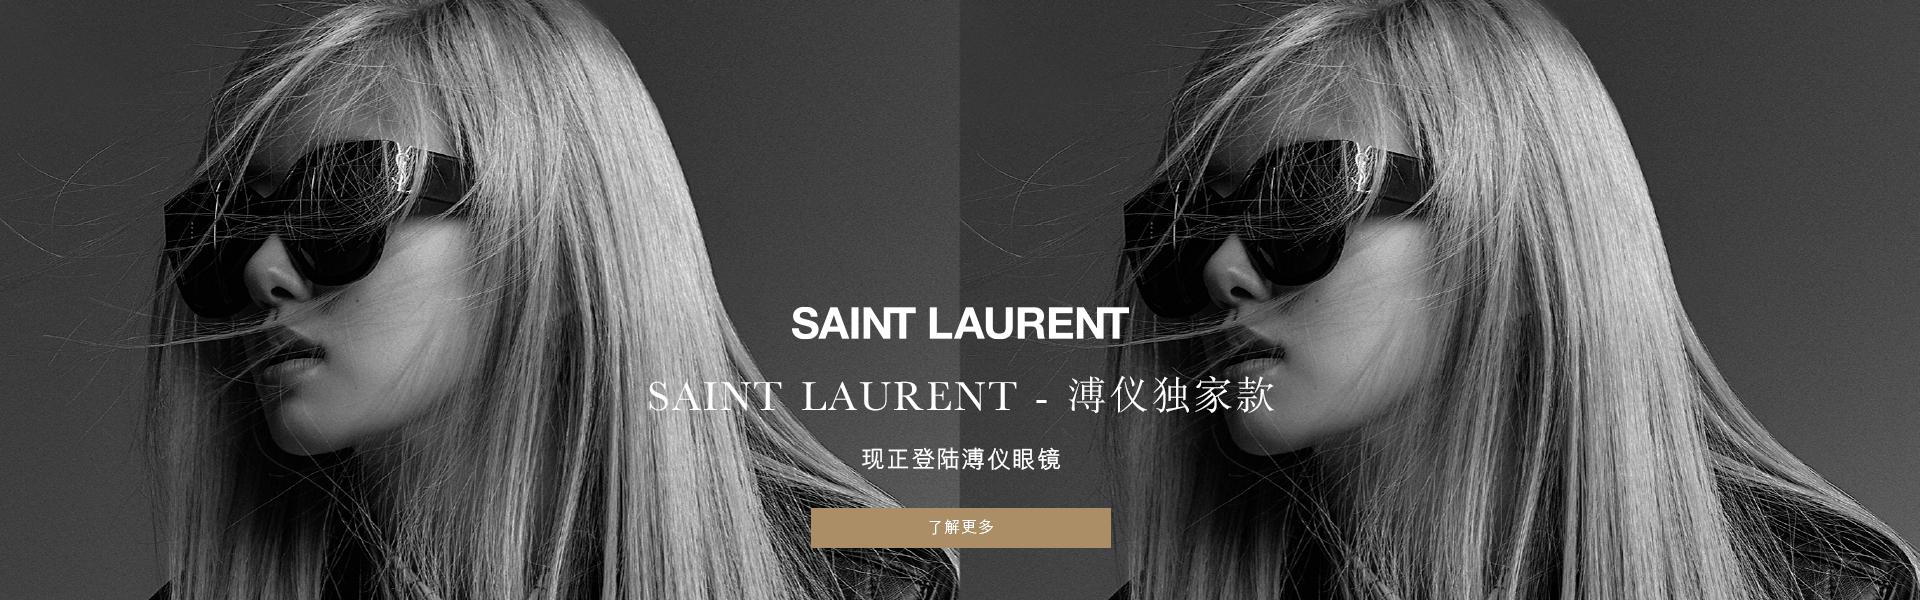 SAINT LAURENT - 溥仪独家款